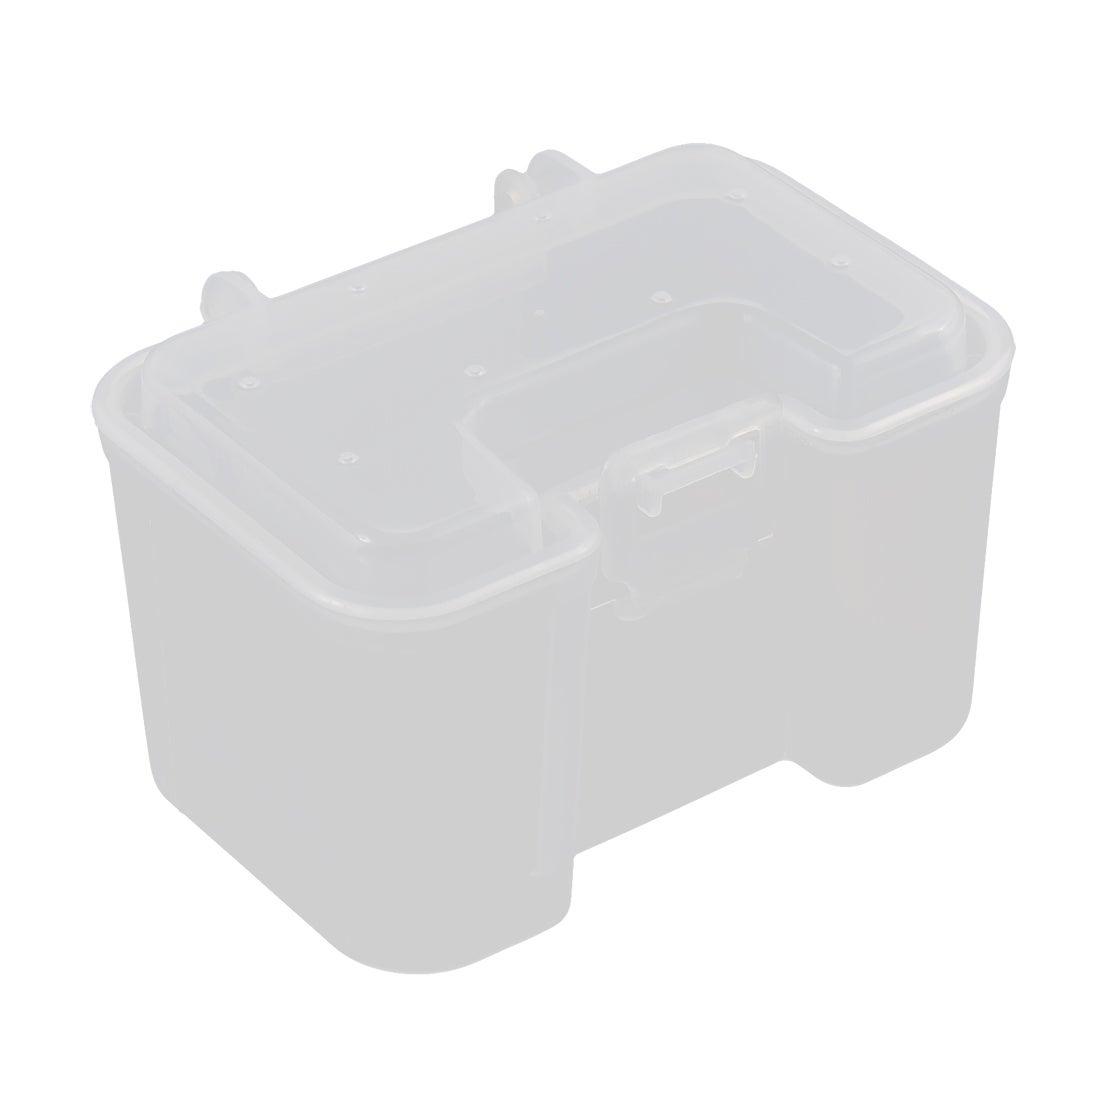 Unique Bargains Visible Plastic Clear Fishing Lure Bait Hooks Tackle Storage Box Case Container